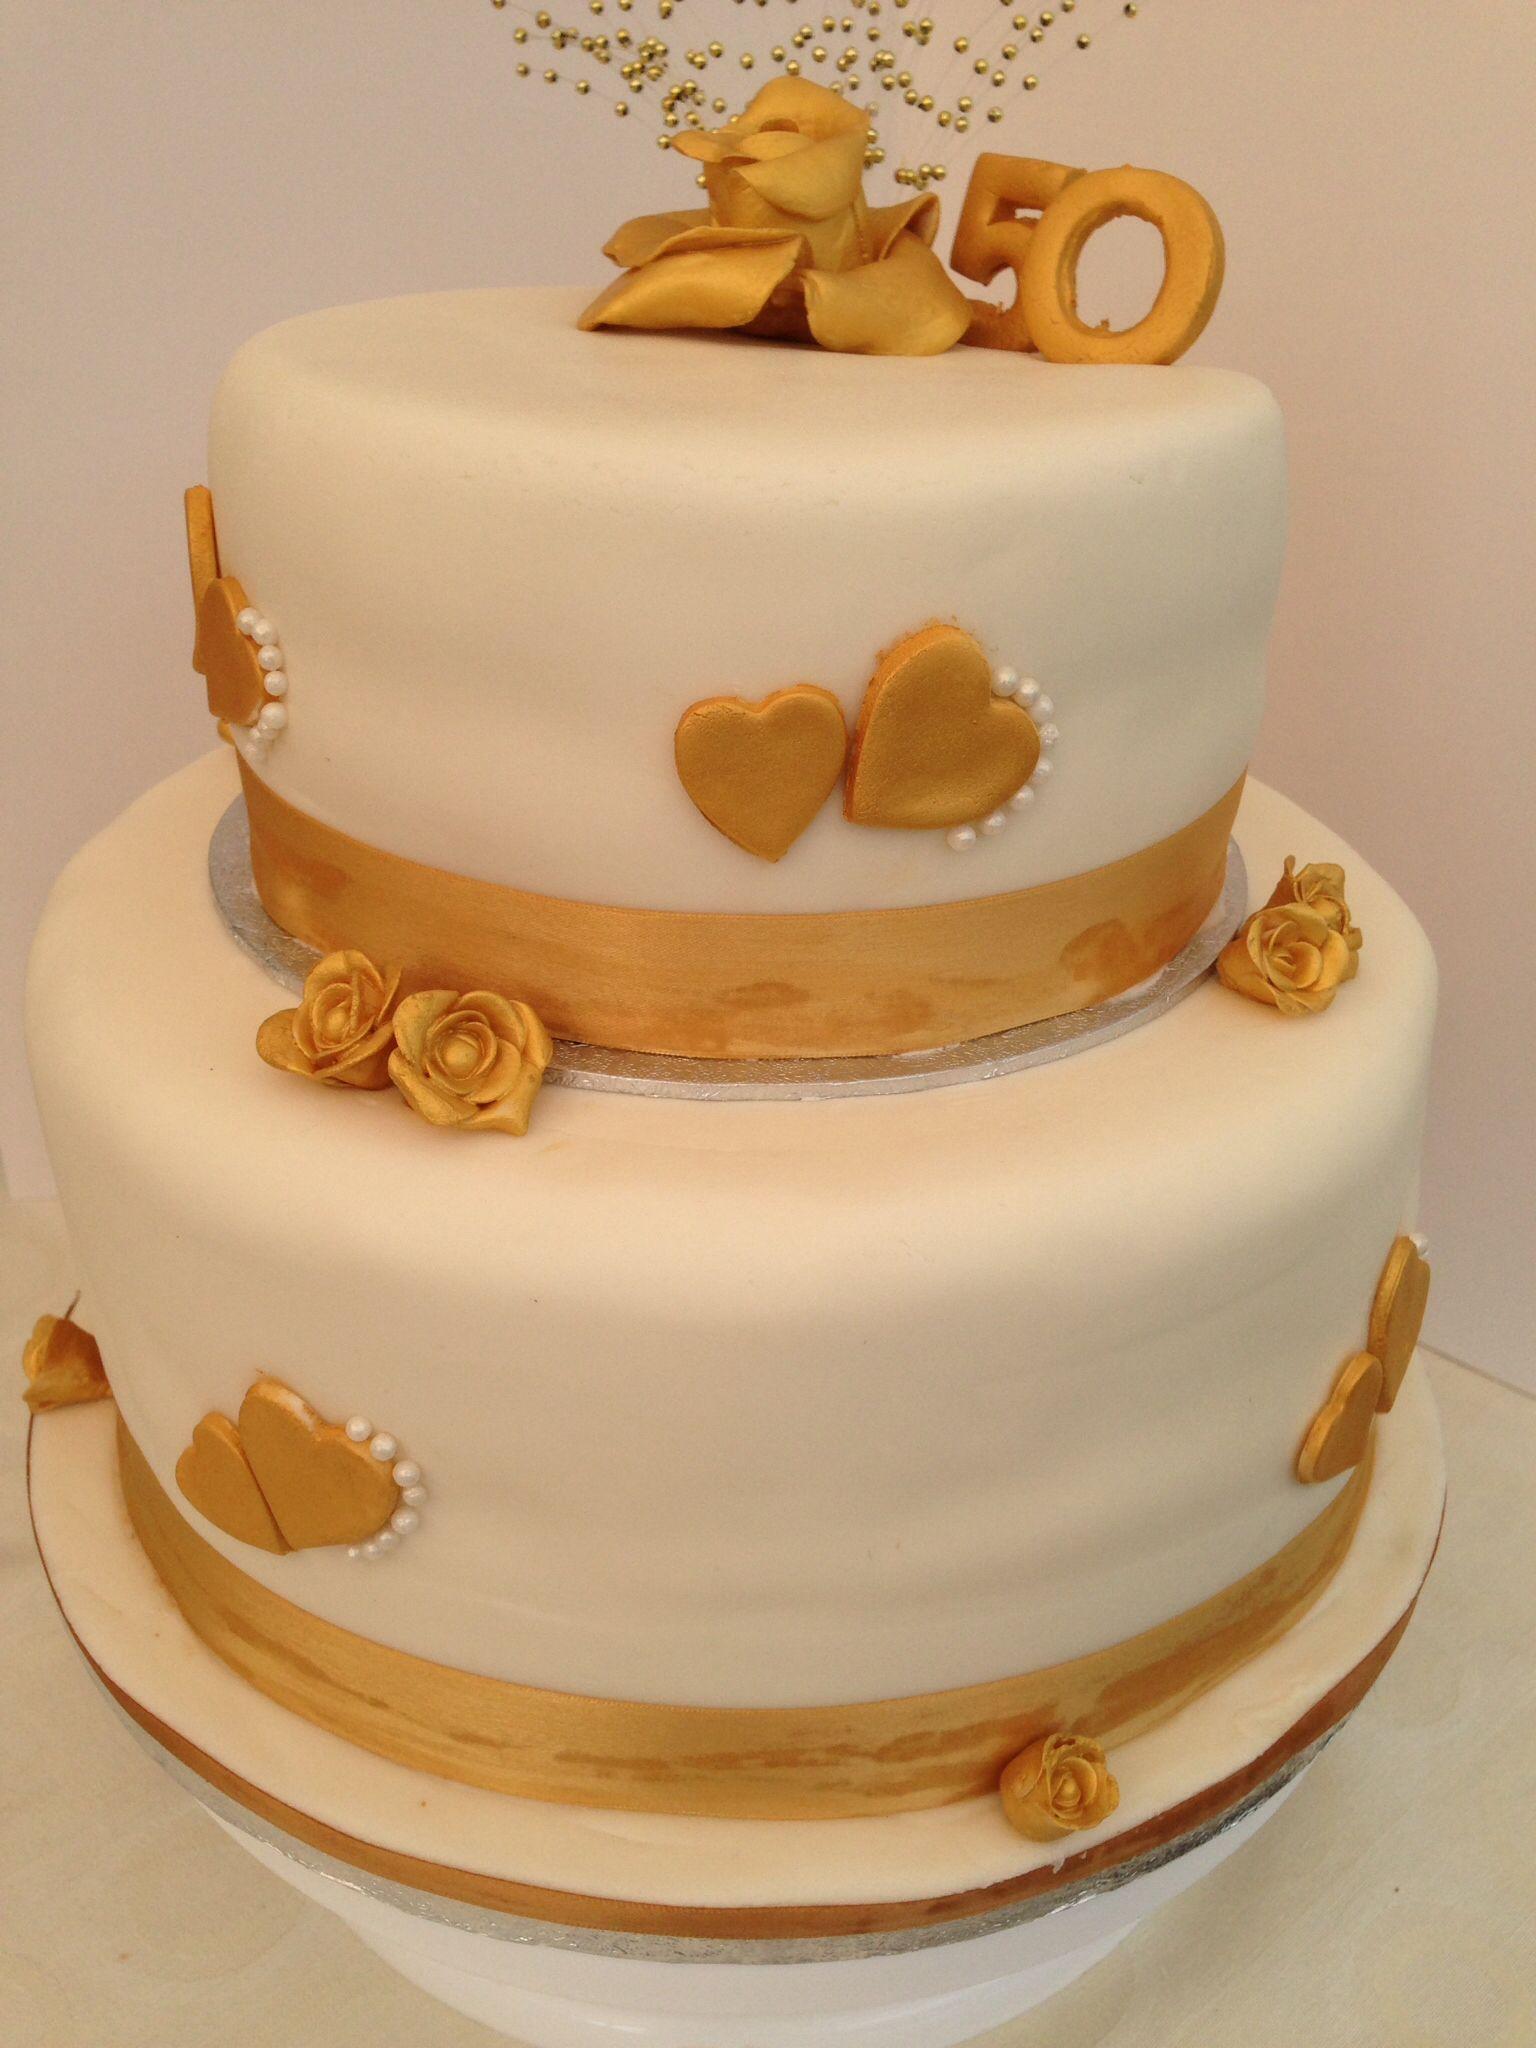 Golden Wedding Anniversary Cake Wedding Anniversary Cakes